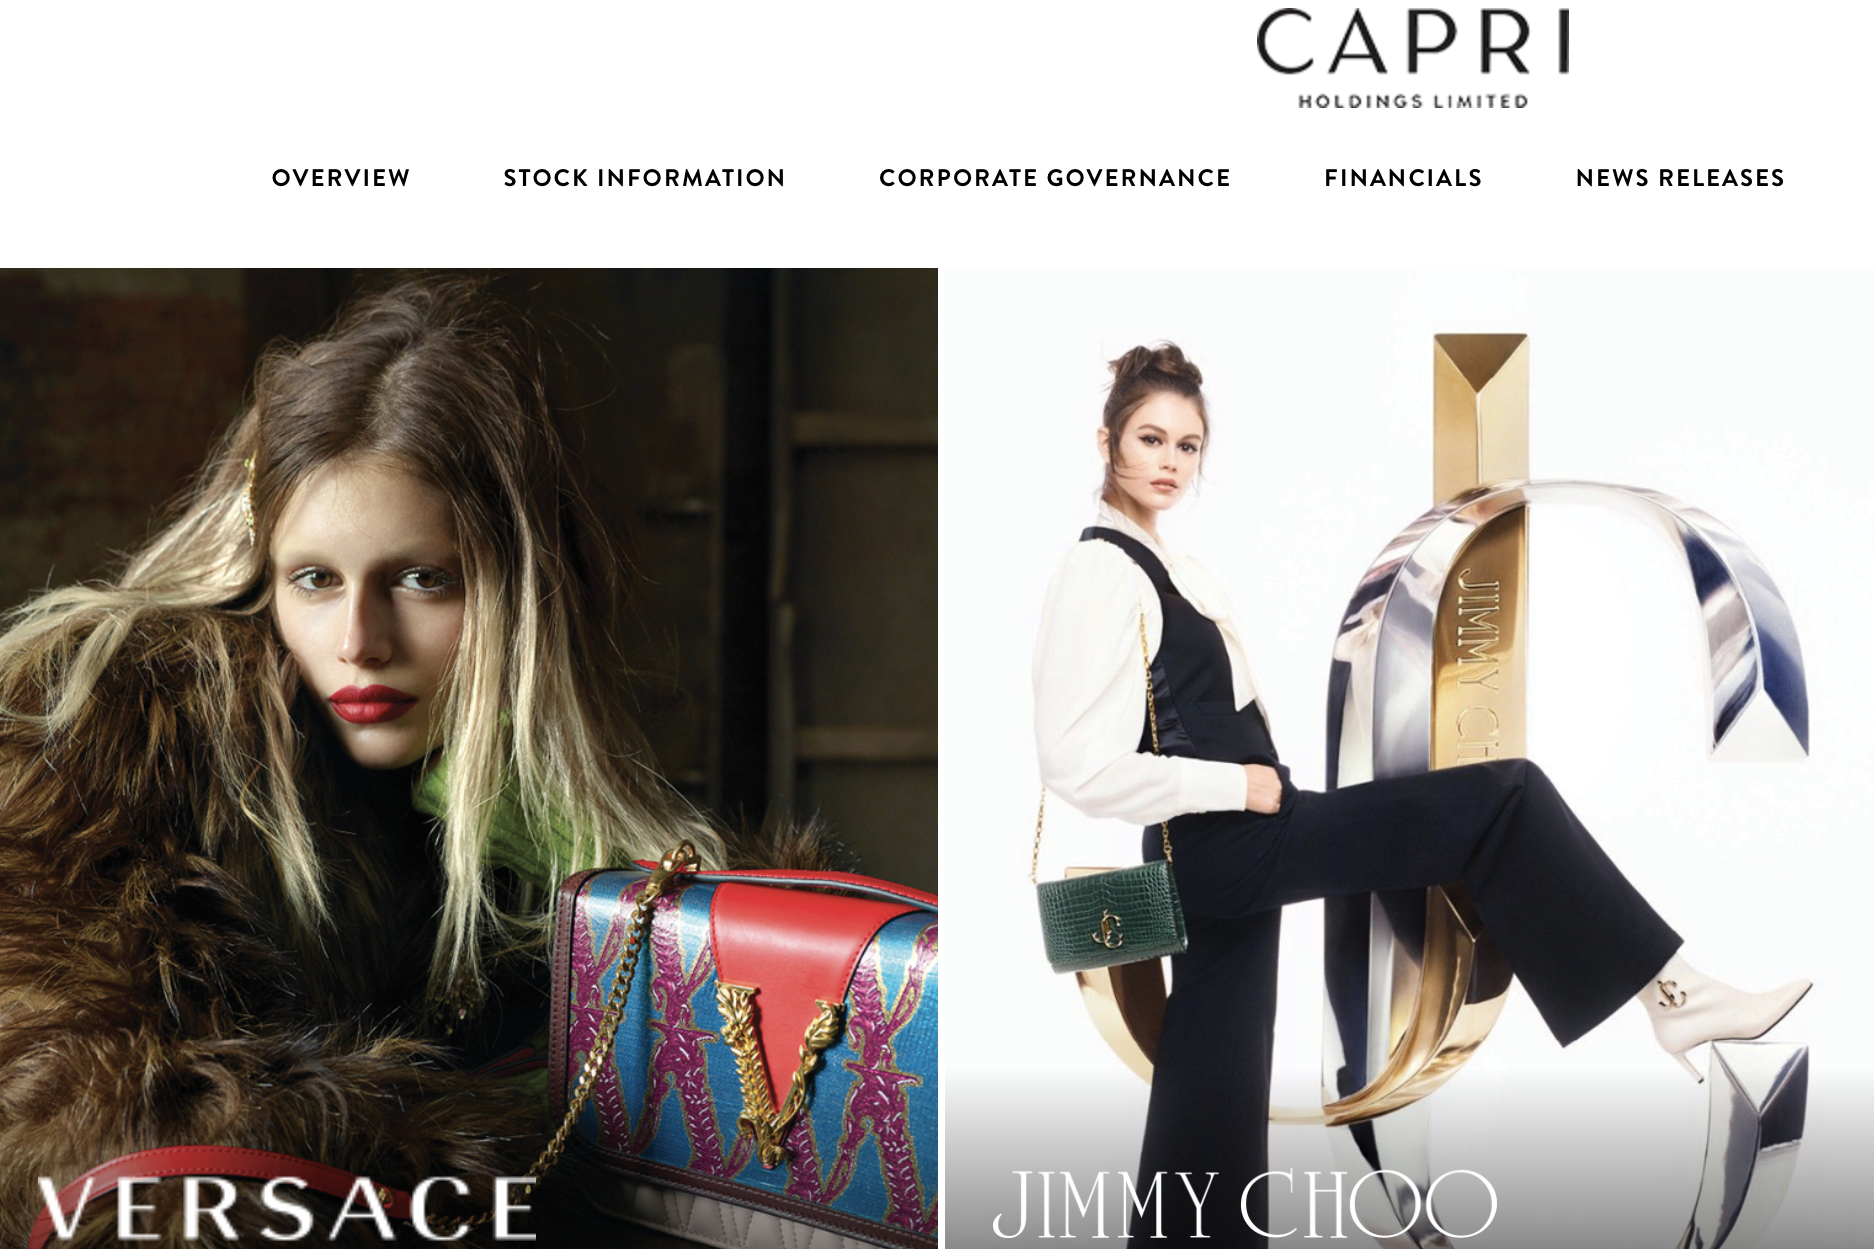 Versace表现超预期,Michael Kors同店销售恢复增长:推动 Capri 集团上季度销售额同比增长15.1%